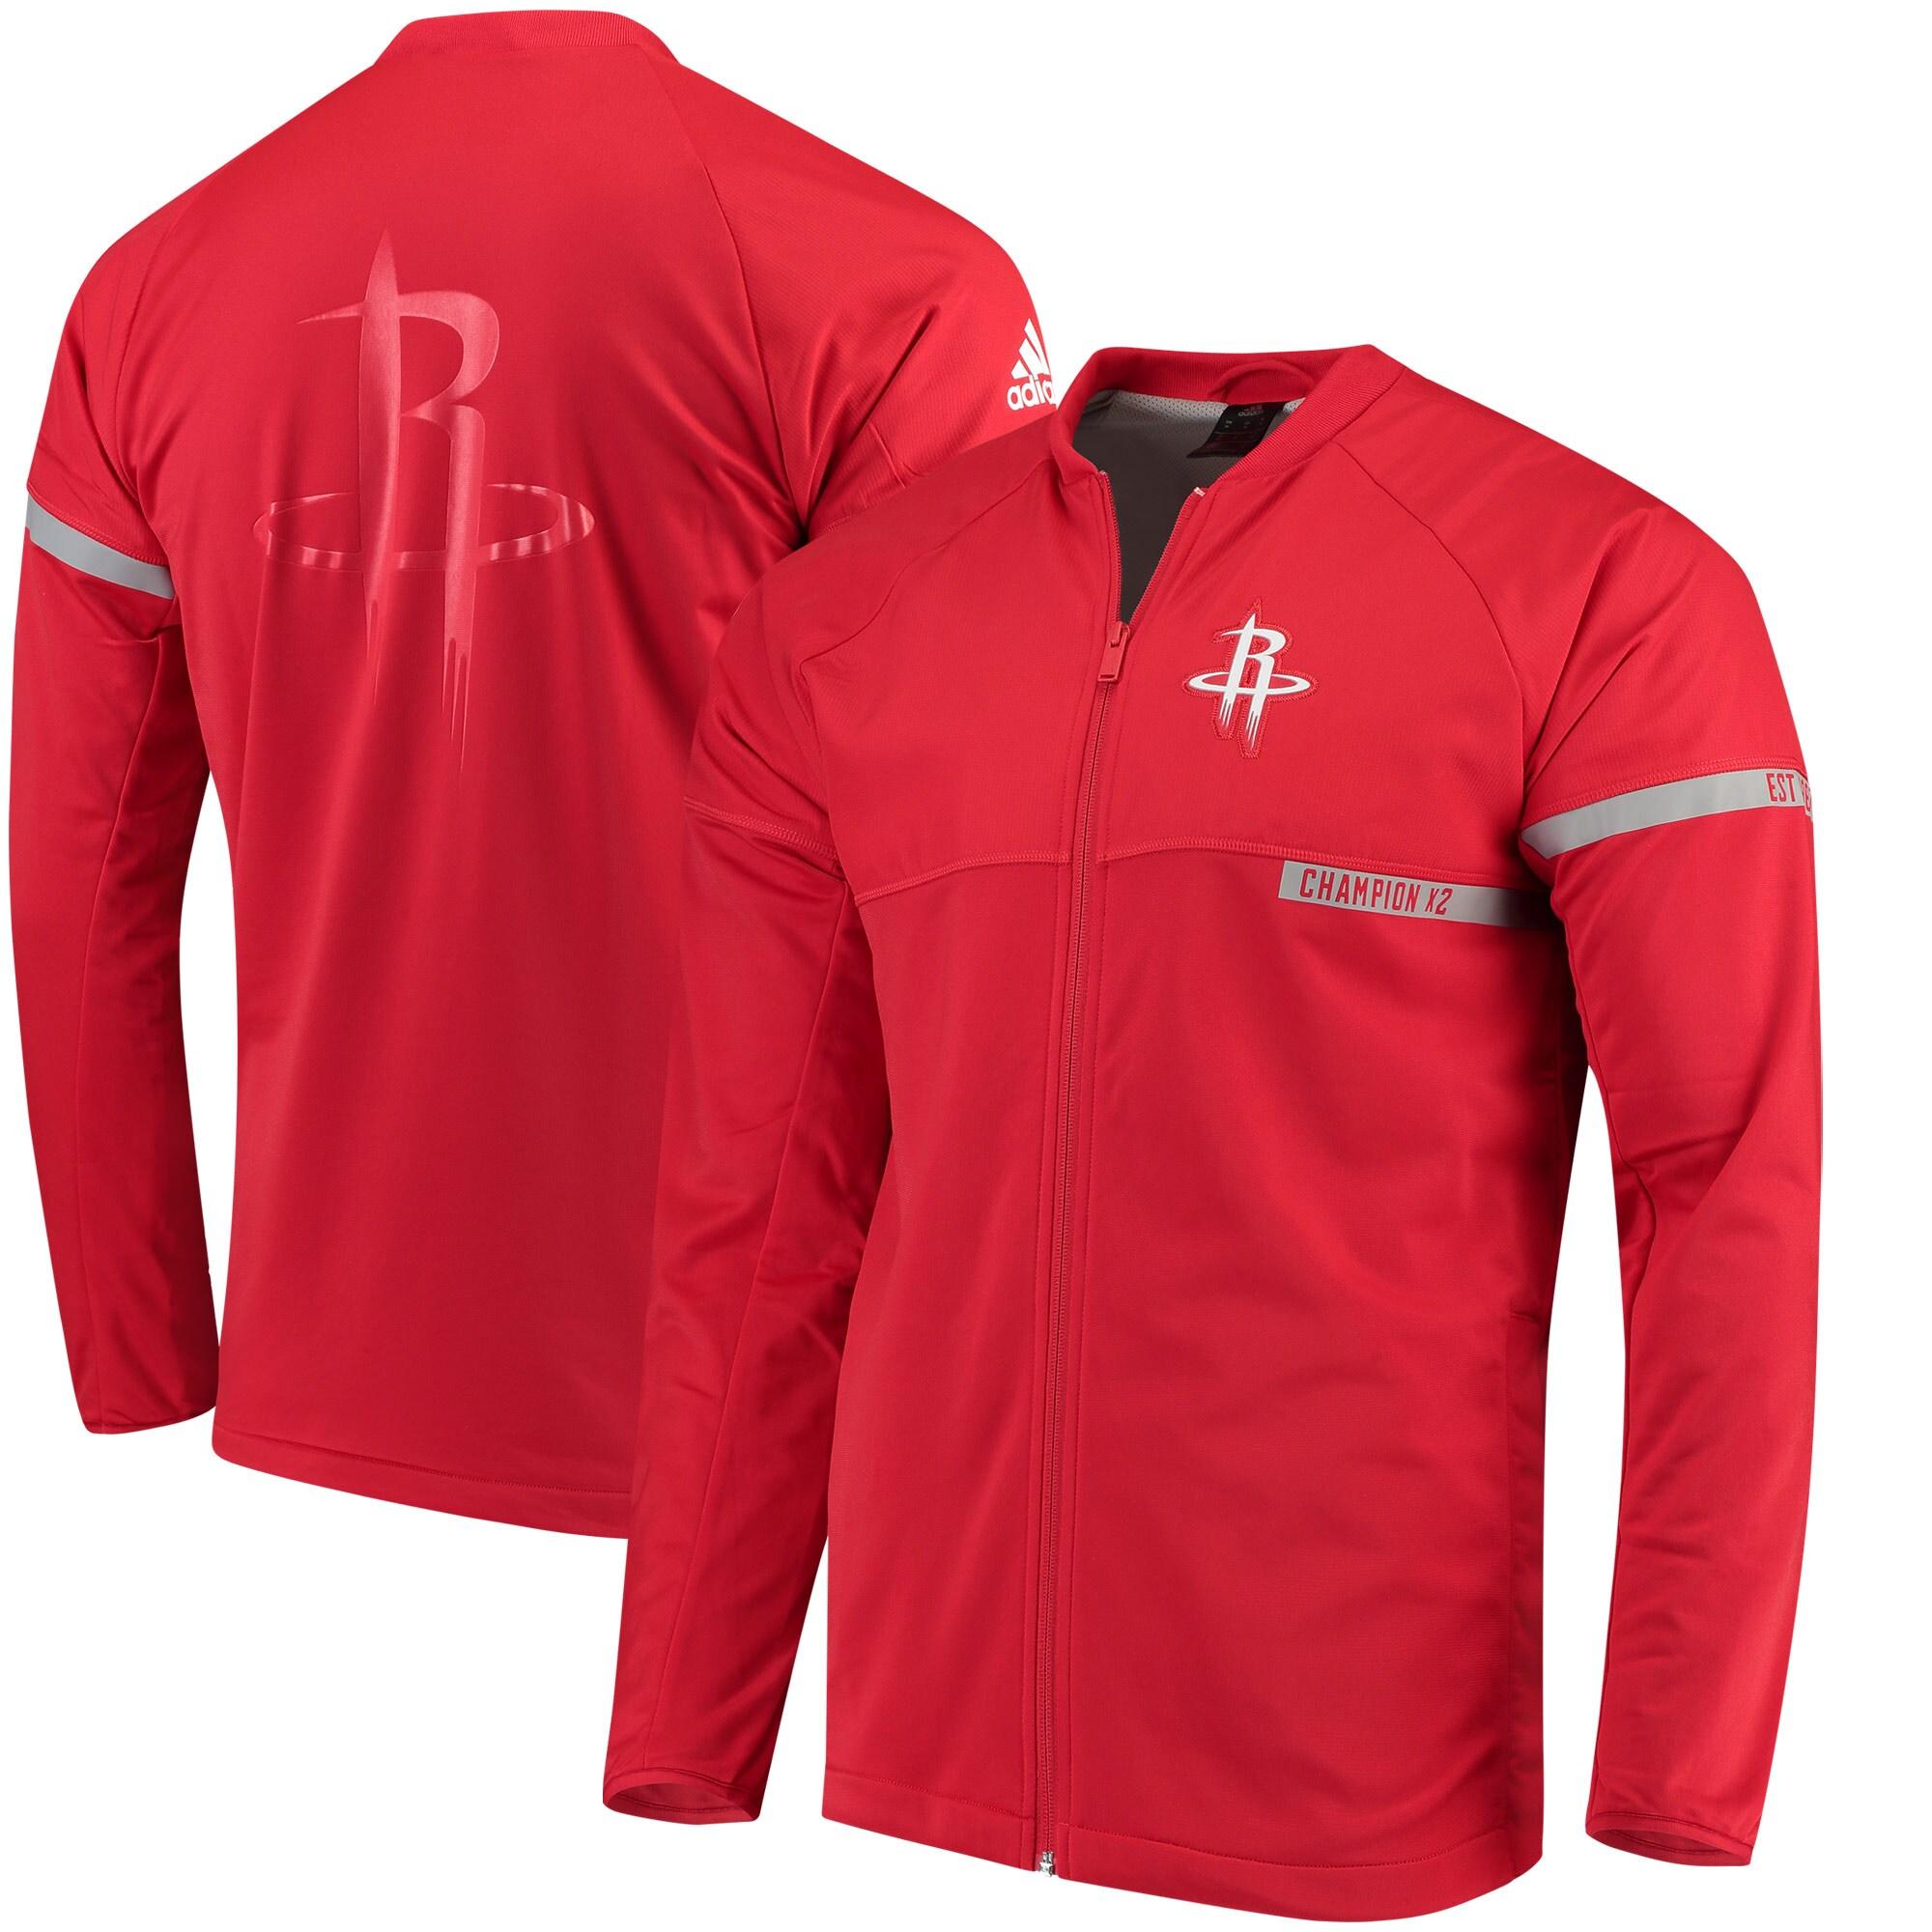 Houston Rockets adidas 2016 On-Court Jacket - Red